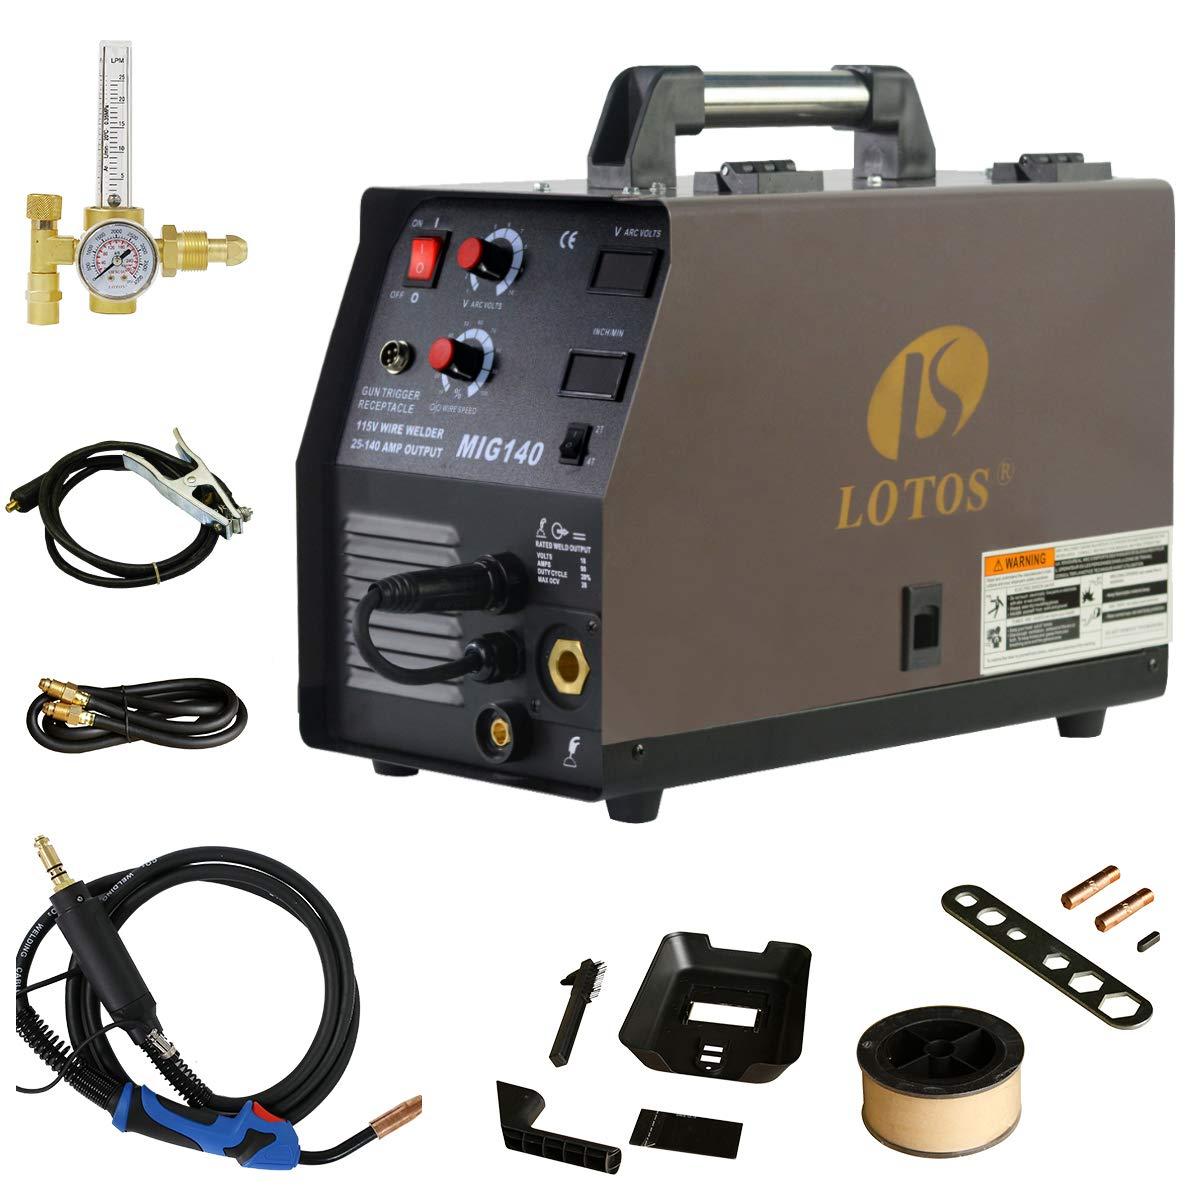 140 Amp MIG Wire Welder, Flux Core & Aluminum Gas Shielded Welding with 2T/4T Switch Argon Regulator, Metal Wire Feeder by LOTOS